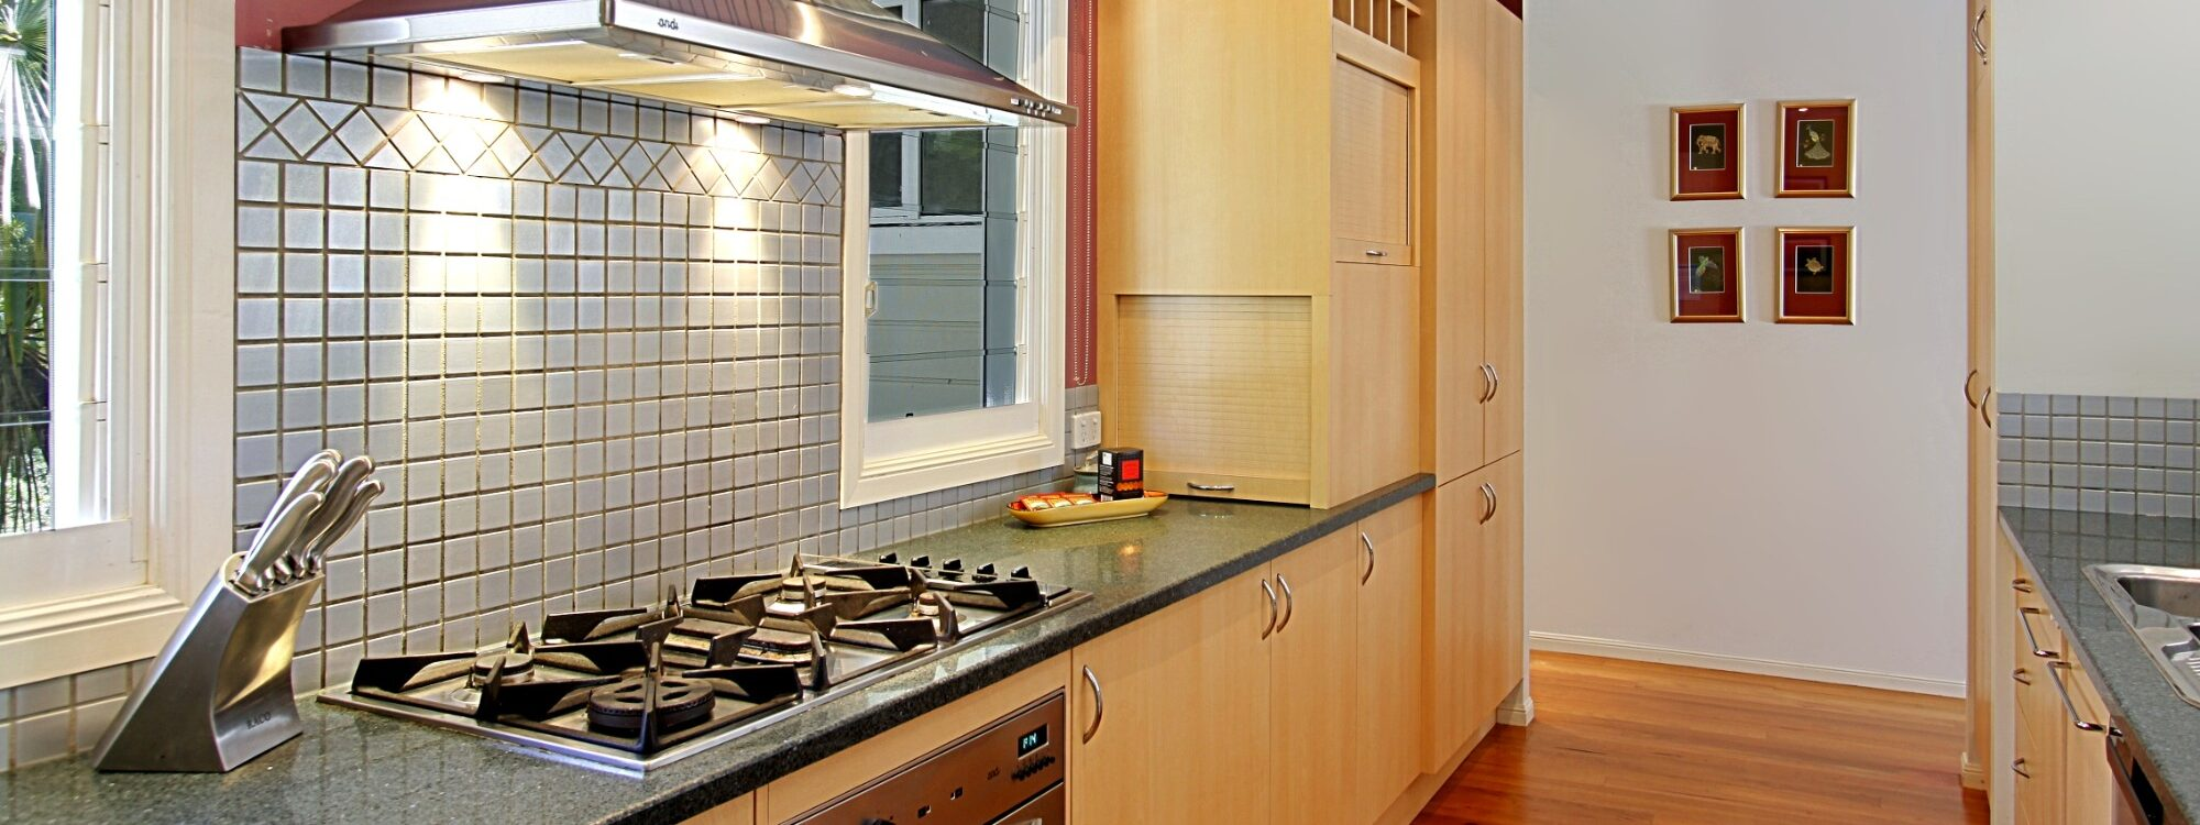 Abode at Byron - Kitchen